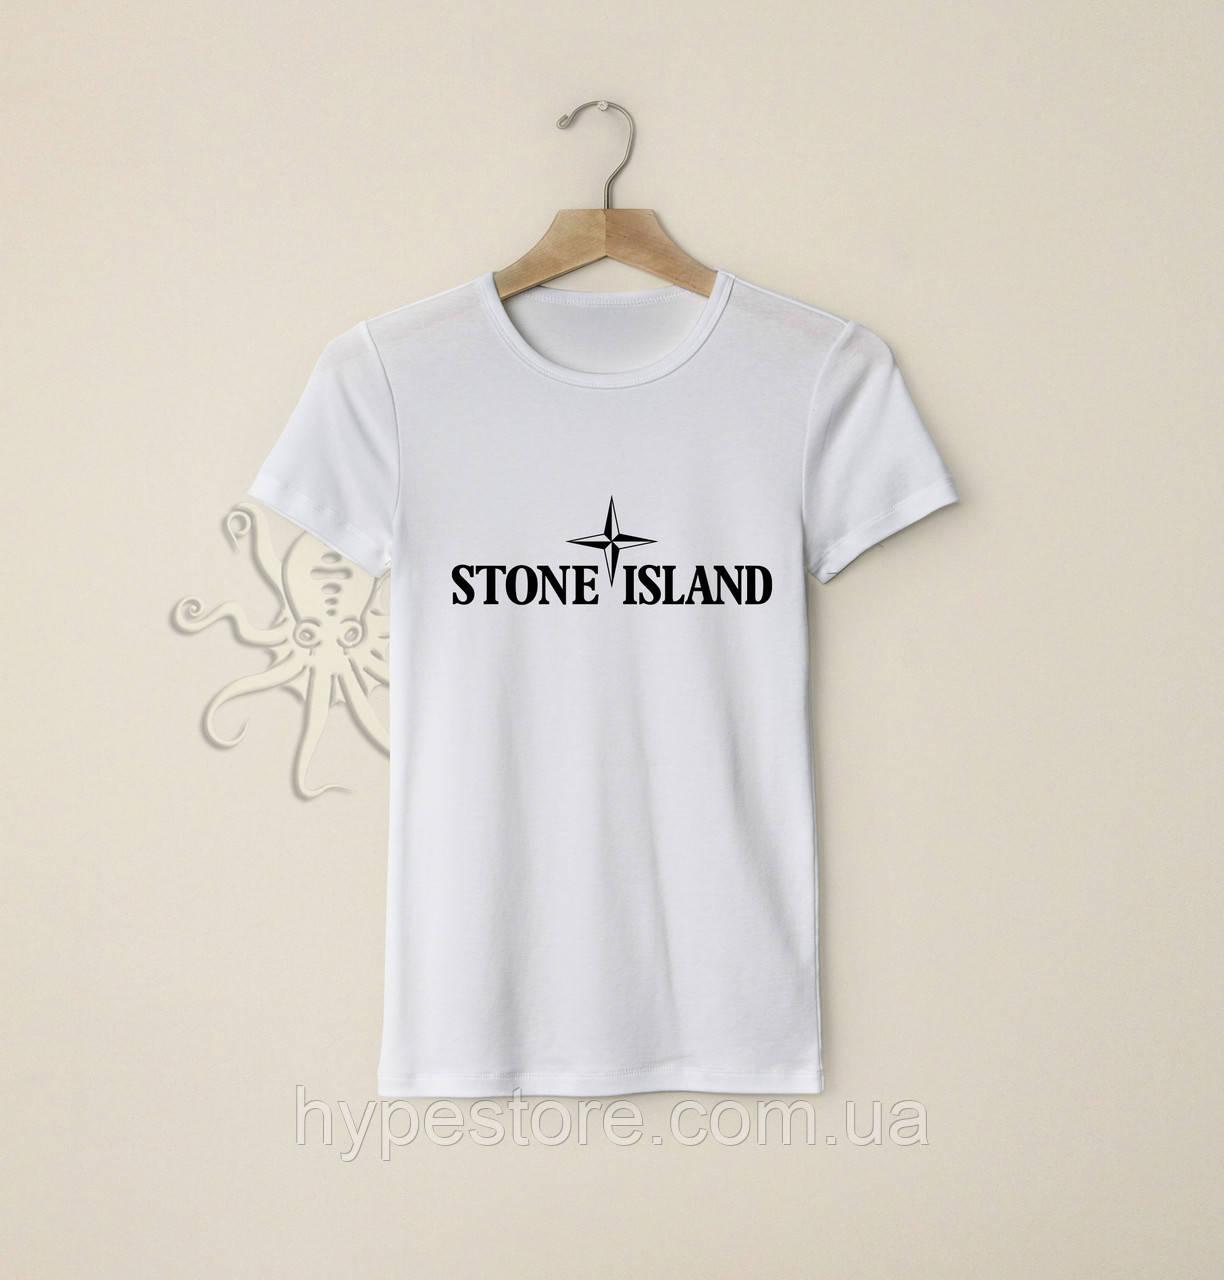 Мужская белая футболка, чоловіча футболка Stone Island (черный лого), Реплика